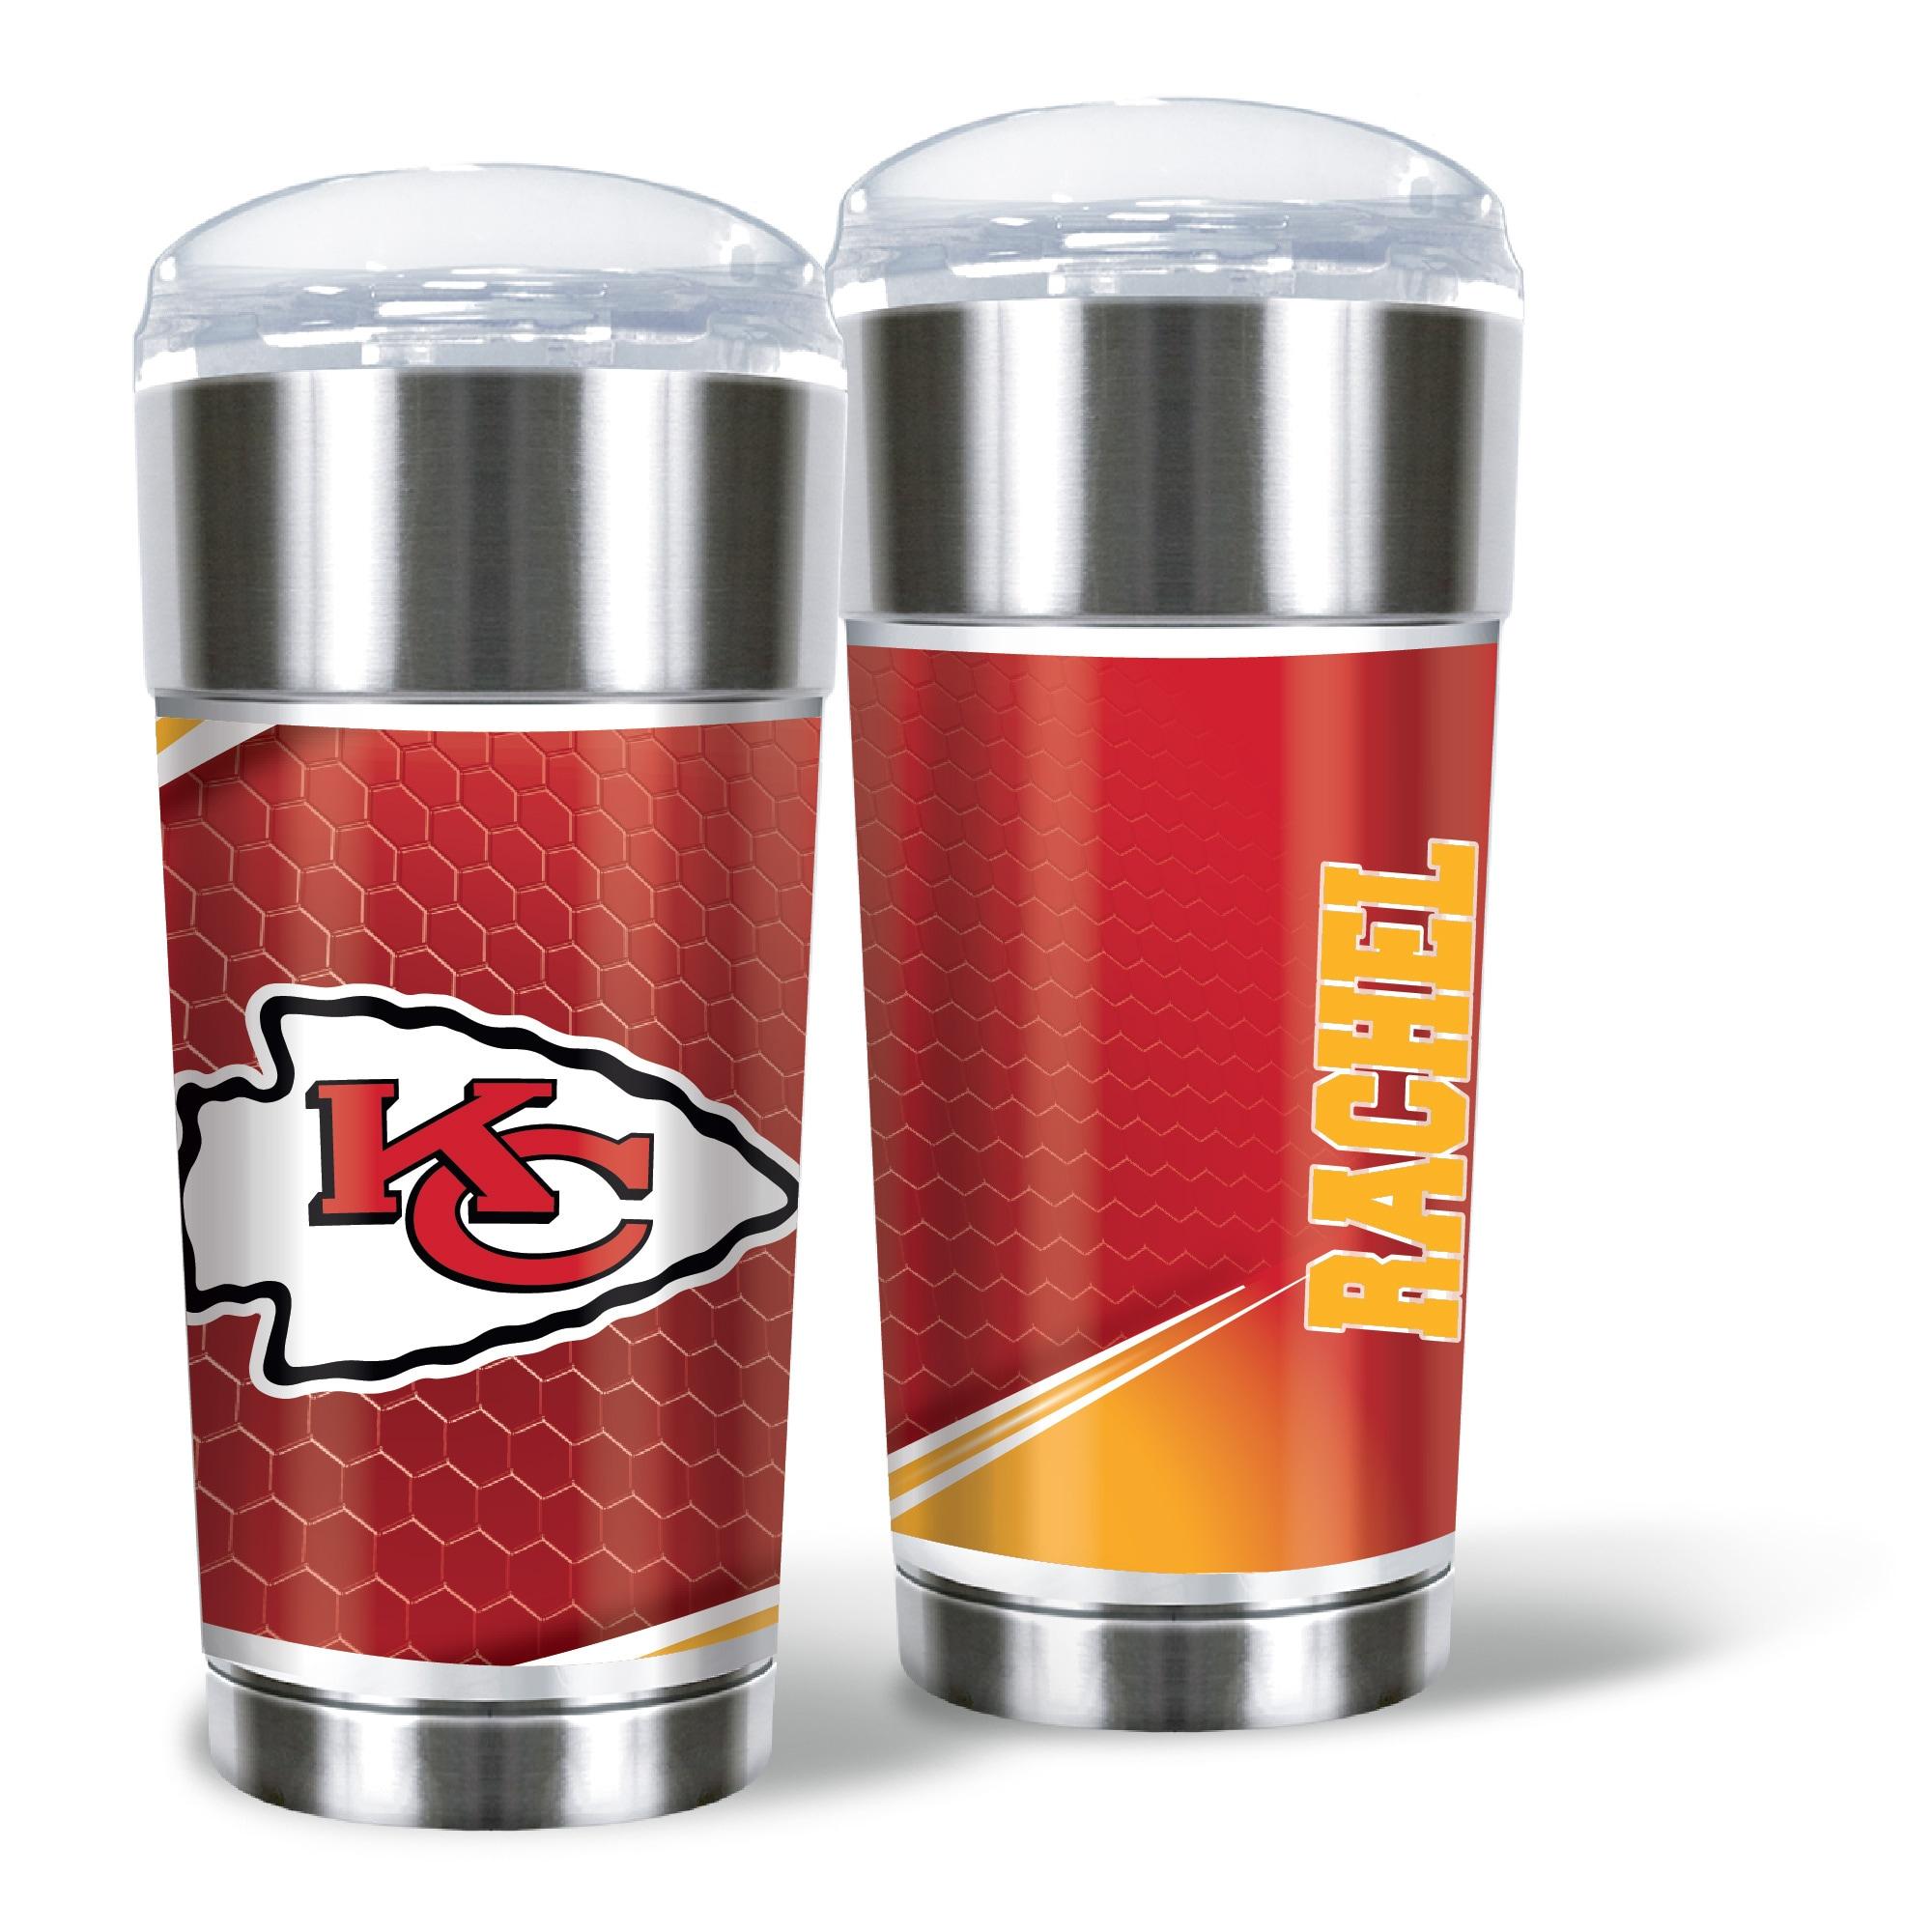 Kansas City Chiefs 24oz. Personalized Eagle Tumbler